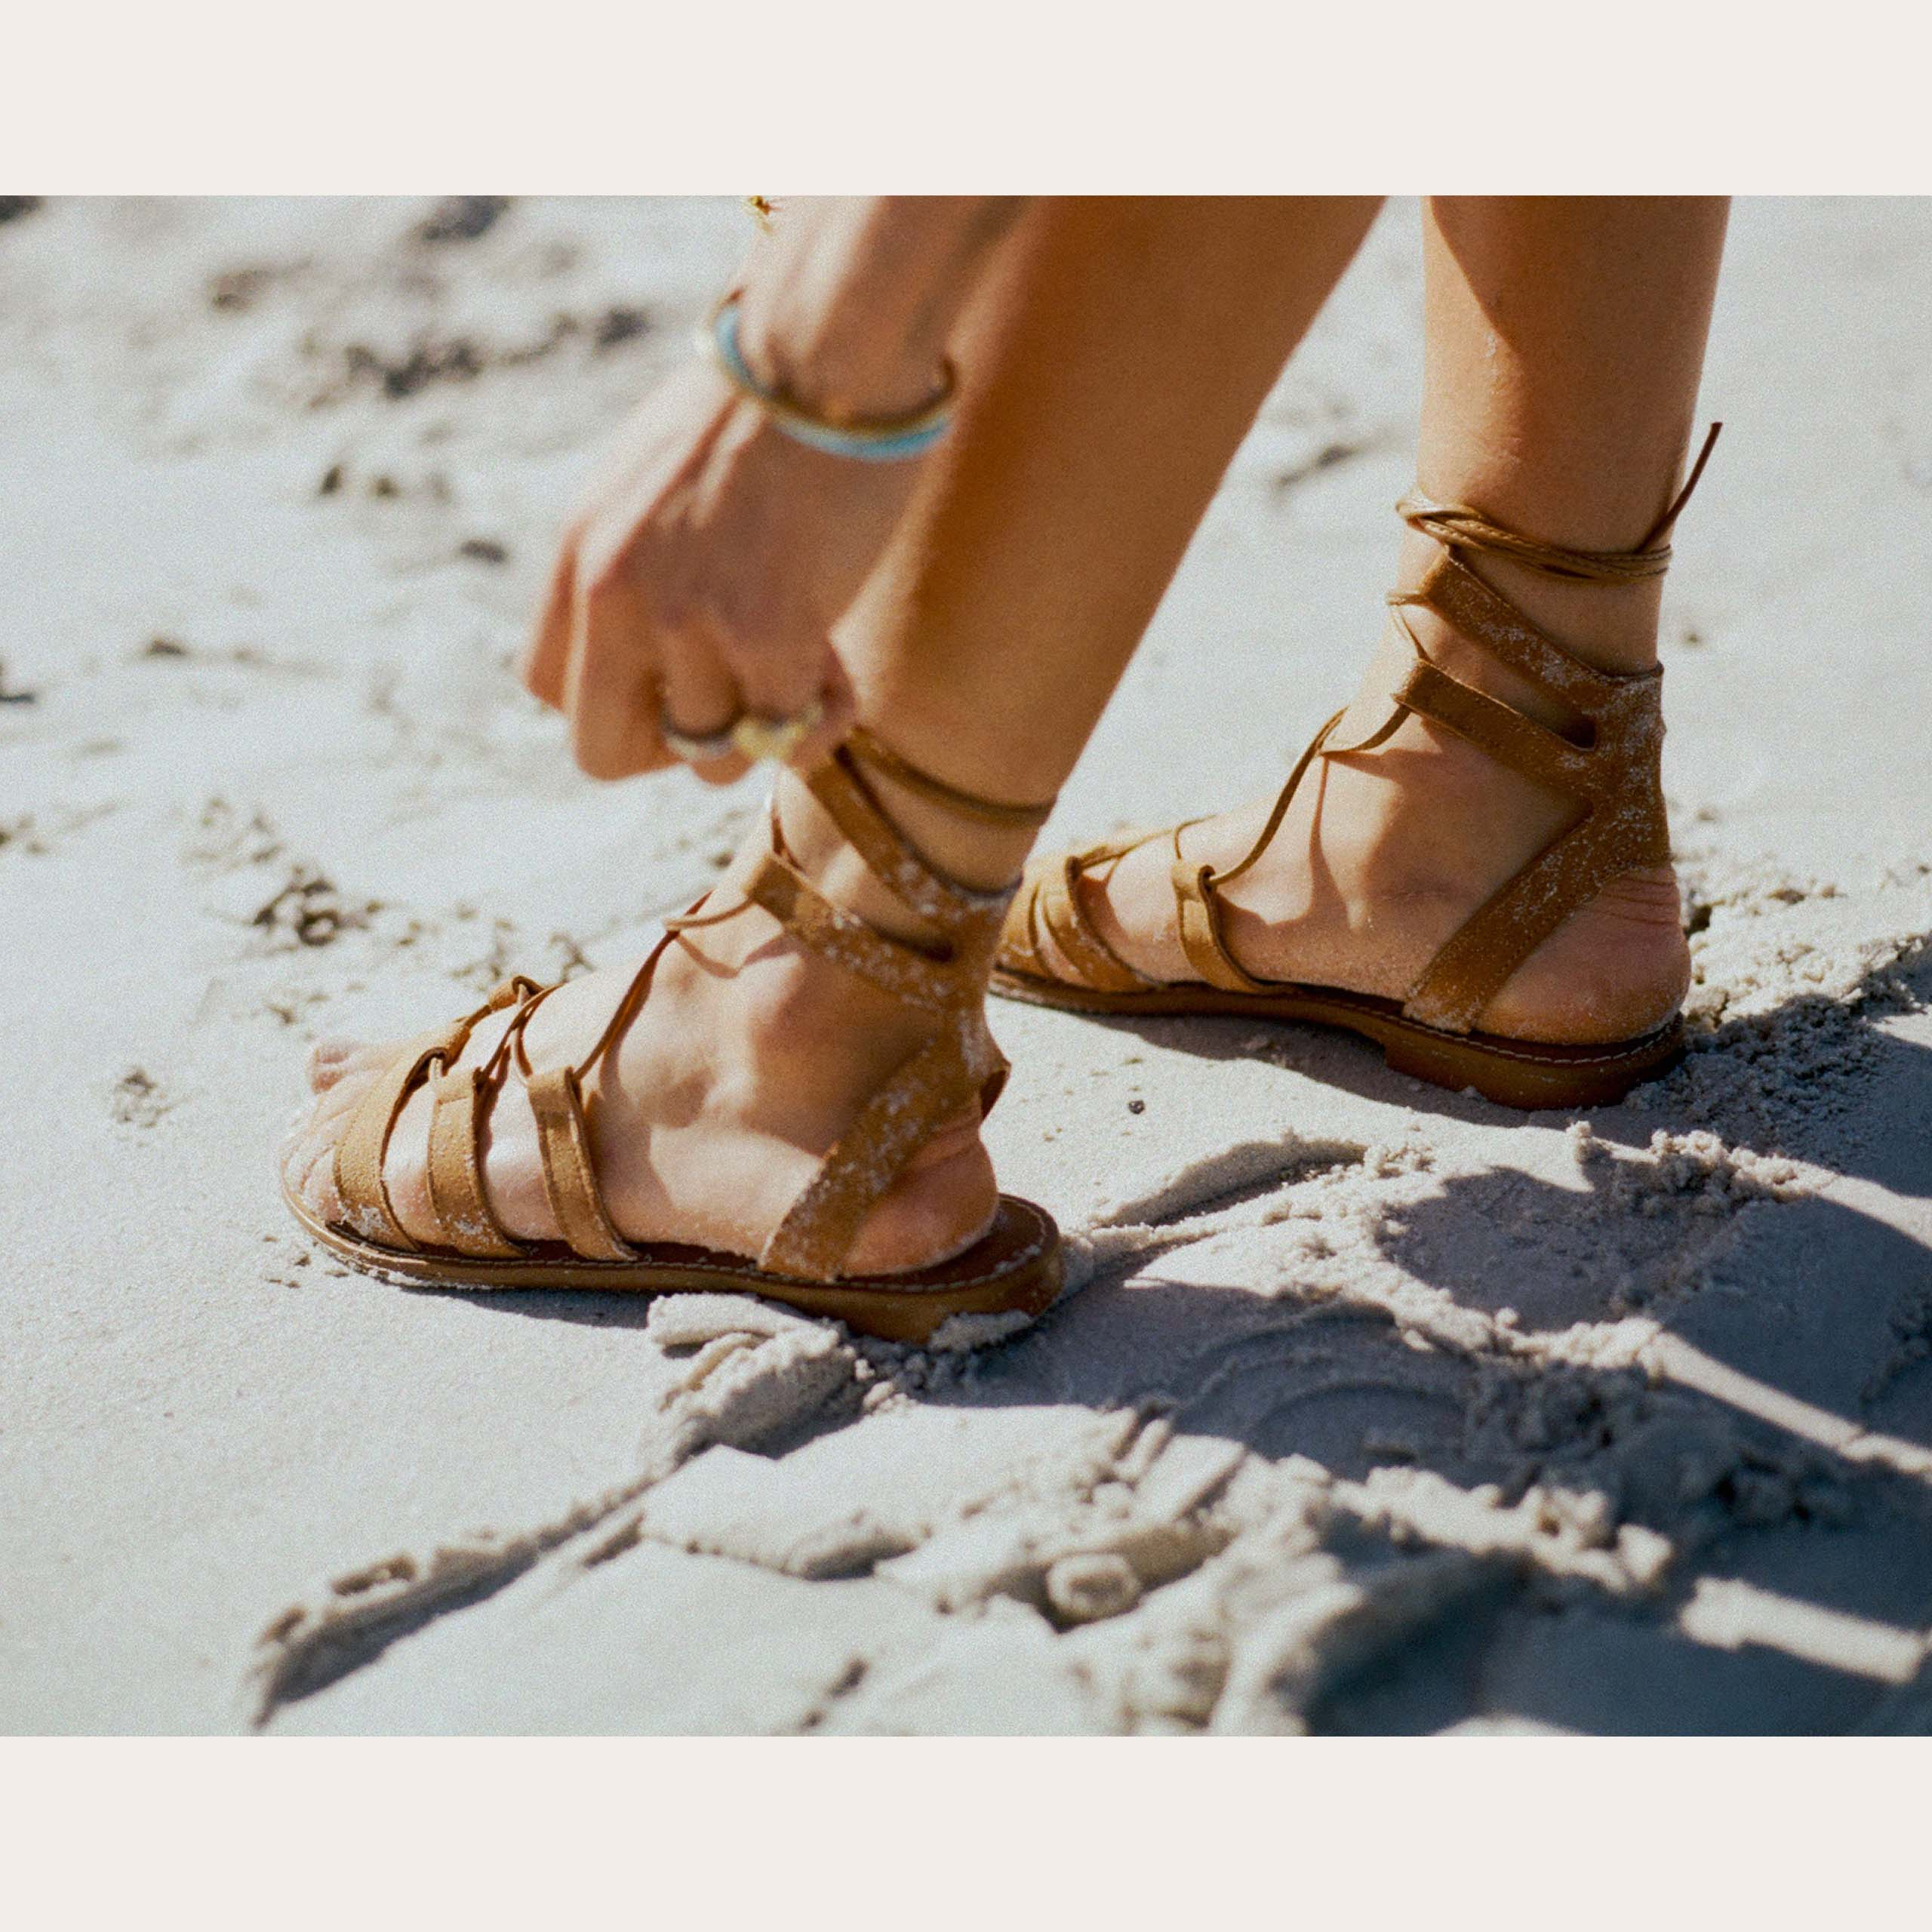 fe-camel_lintsandalen sandals travelsandals vegan sustainable sandals wikkelsandalen kopiëren